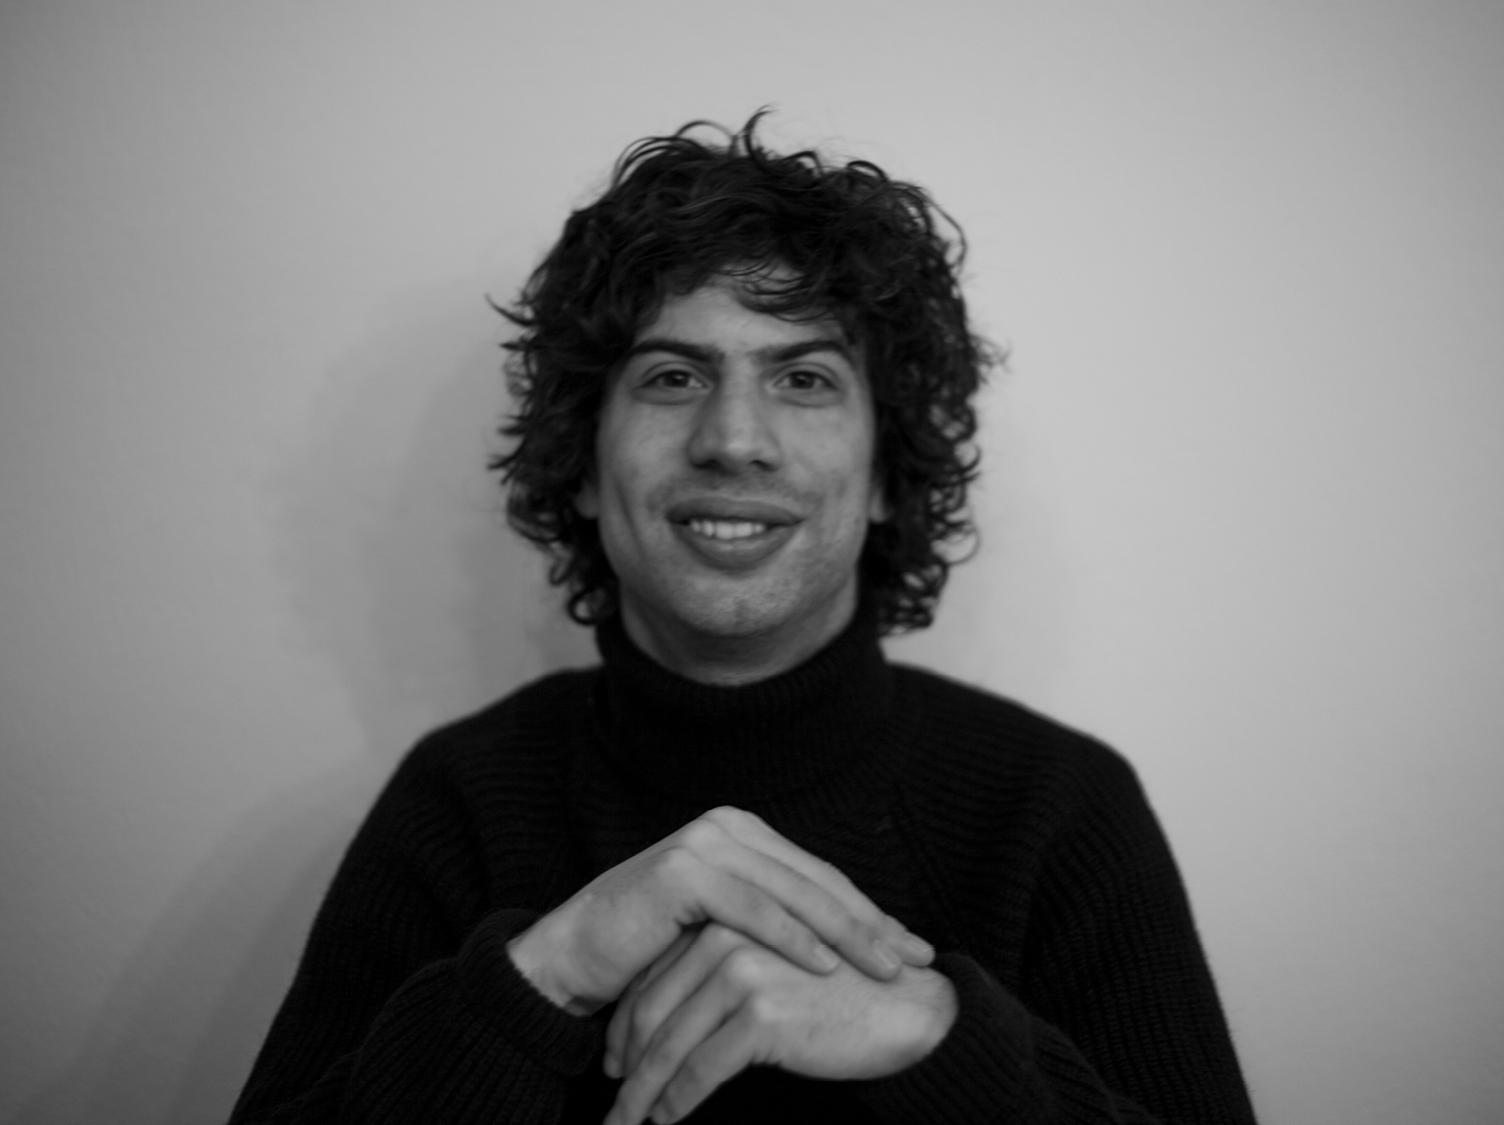 Stefano Masserini